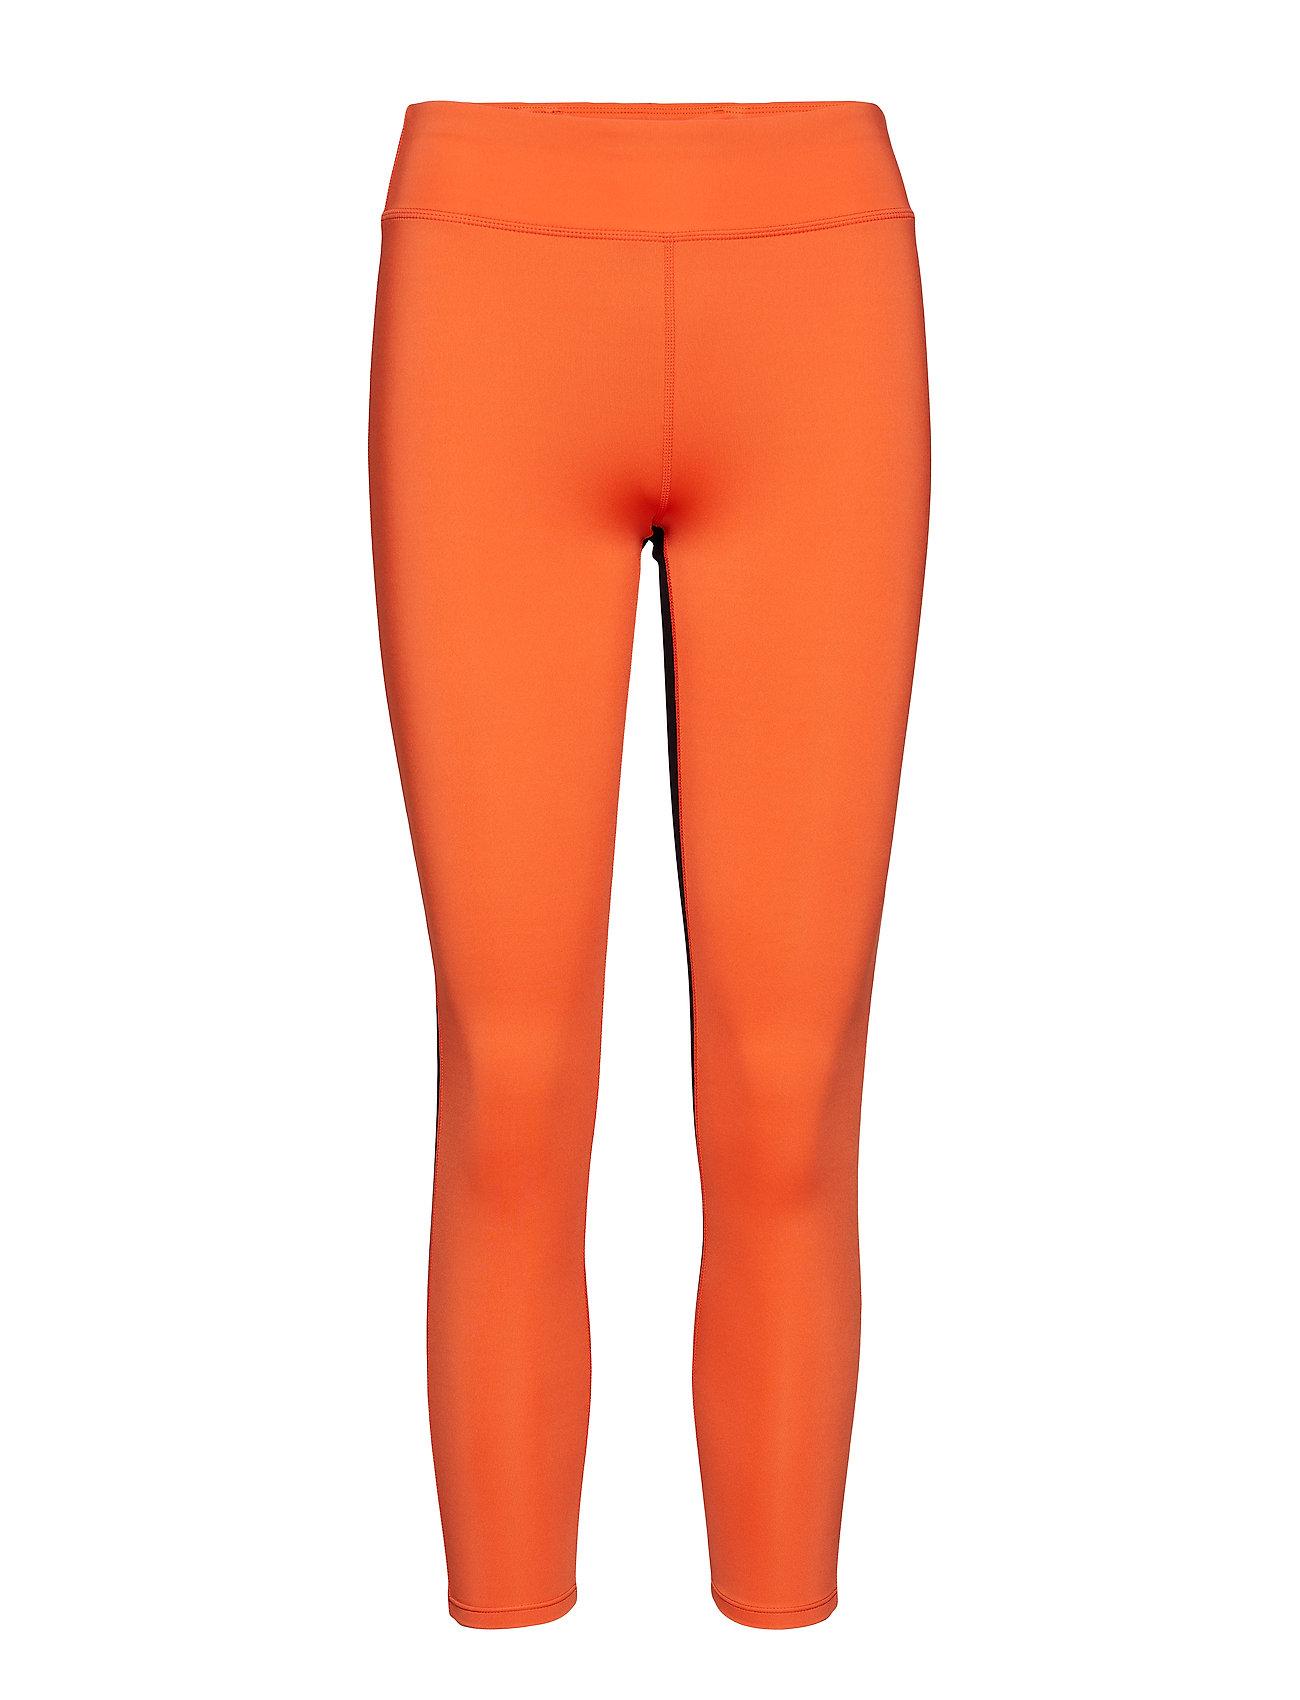 Calvin Klein Performance 7/8 TIGHT LOGO LEG